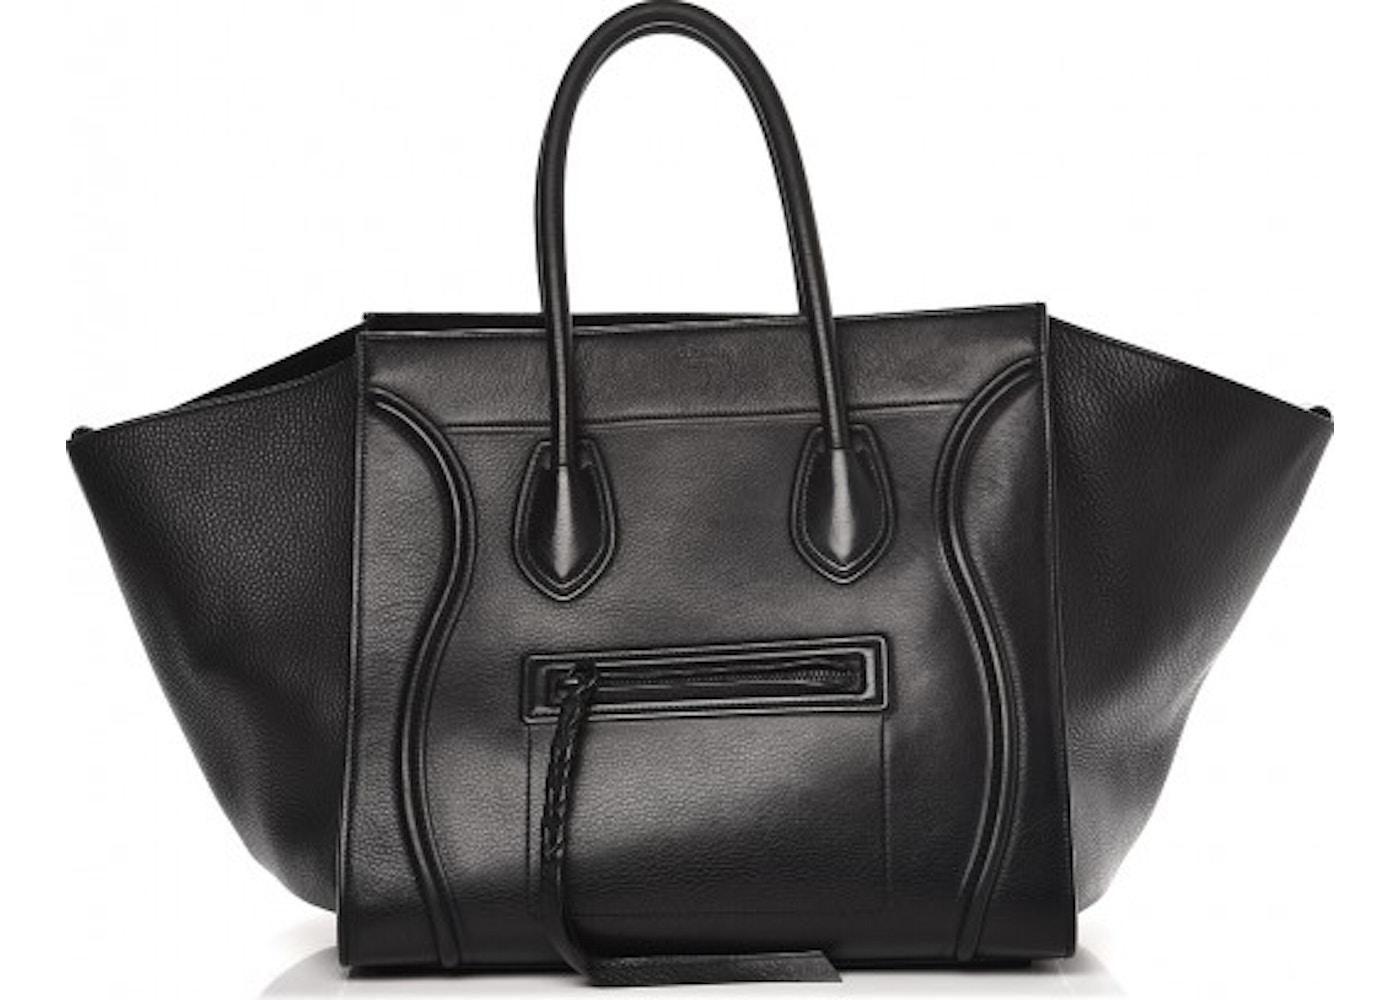 ce3358cfa363 Celine Cabas Phantom Luggage Medium Black. Medium Black